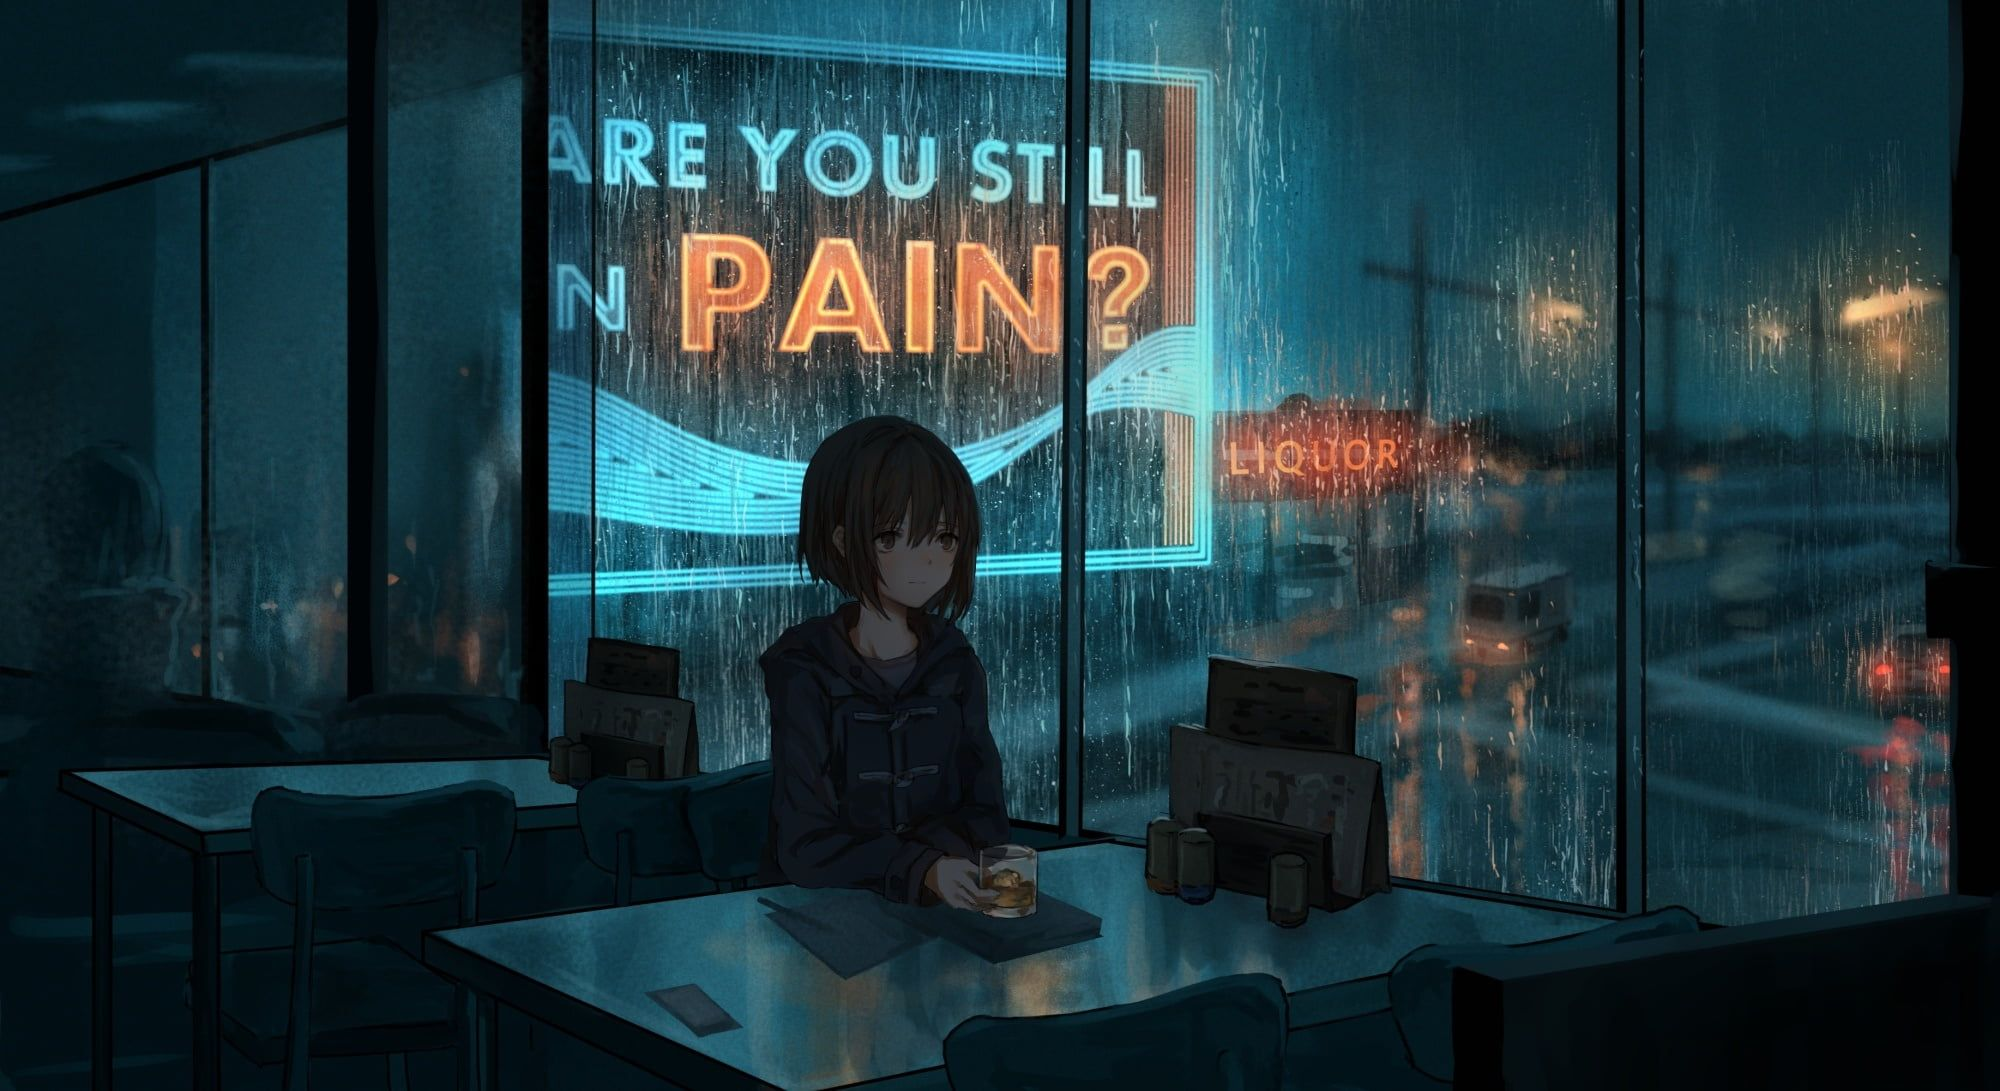 Night Rain Mood Anime Art Cafe 1080p Wallpaper Hdwallpaper Desktop Dark Anime Anime Wallpaper Anime Scenery Desktop wallpaper anime art